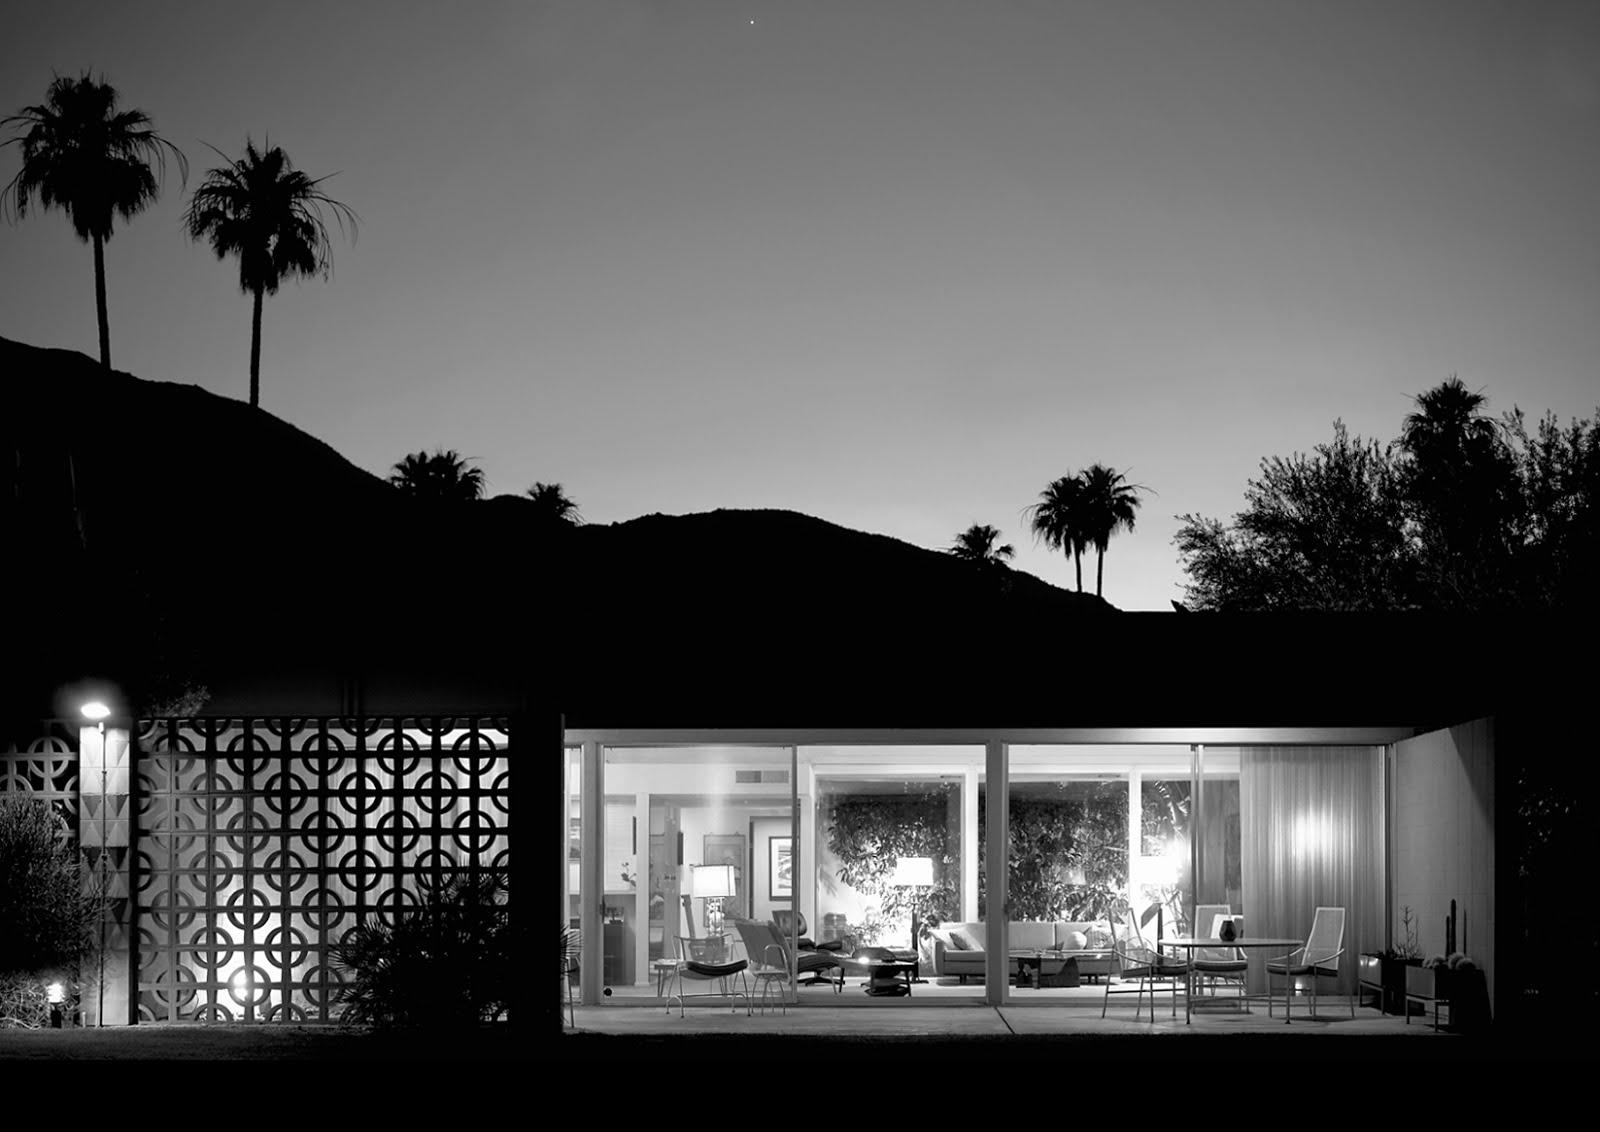 Midnight Modern Modern Design By Moderndesign Org